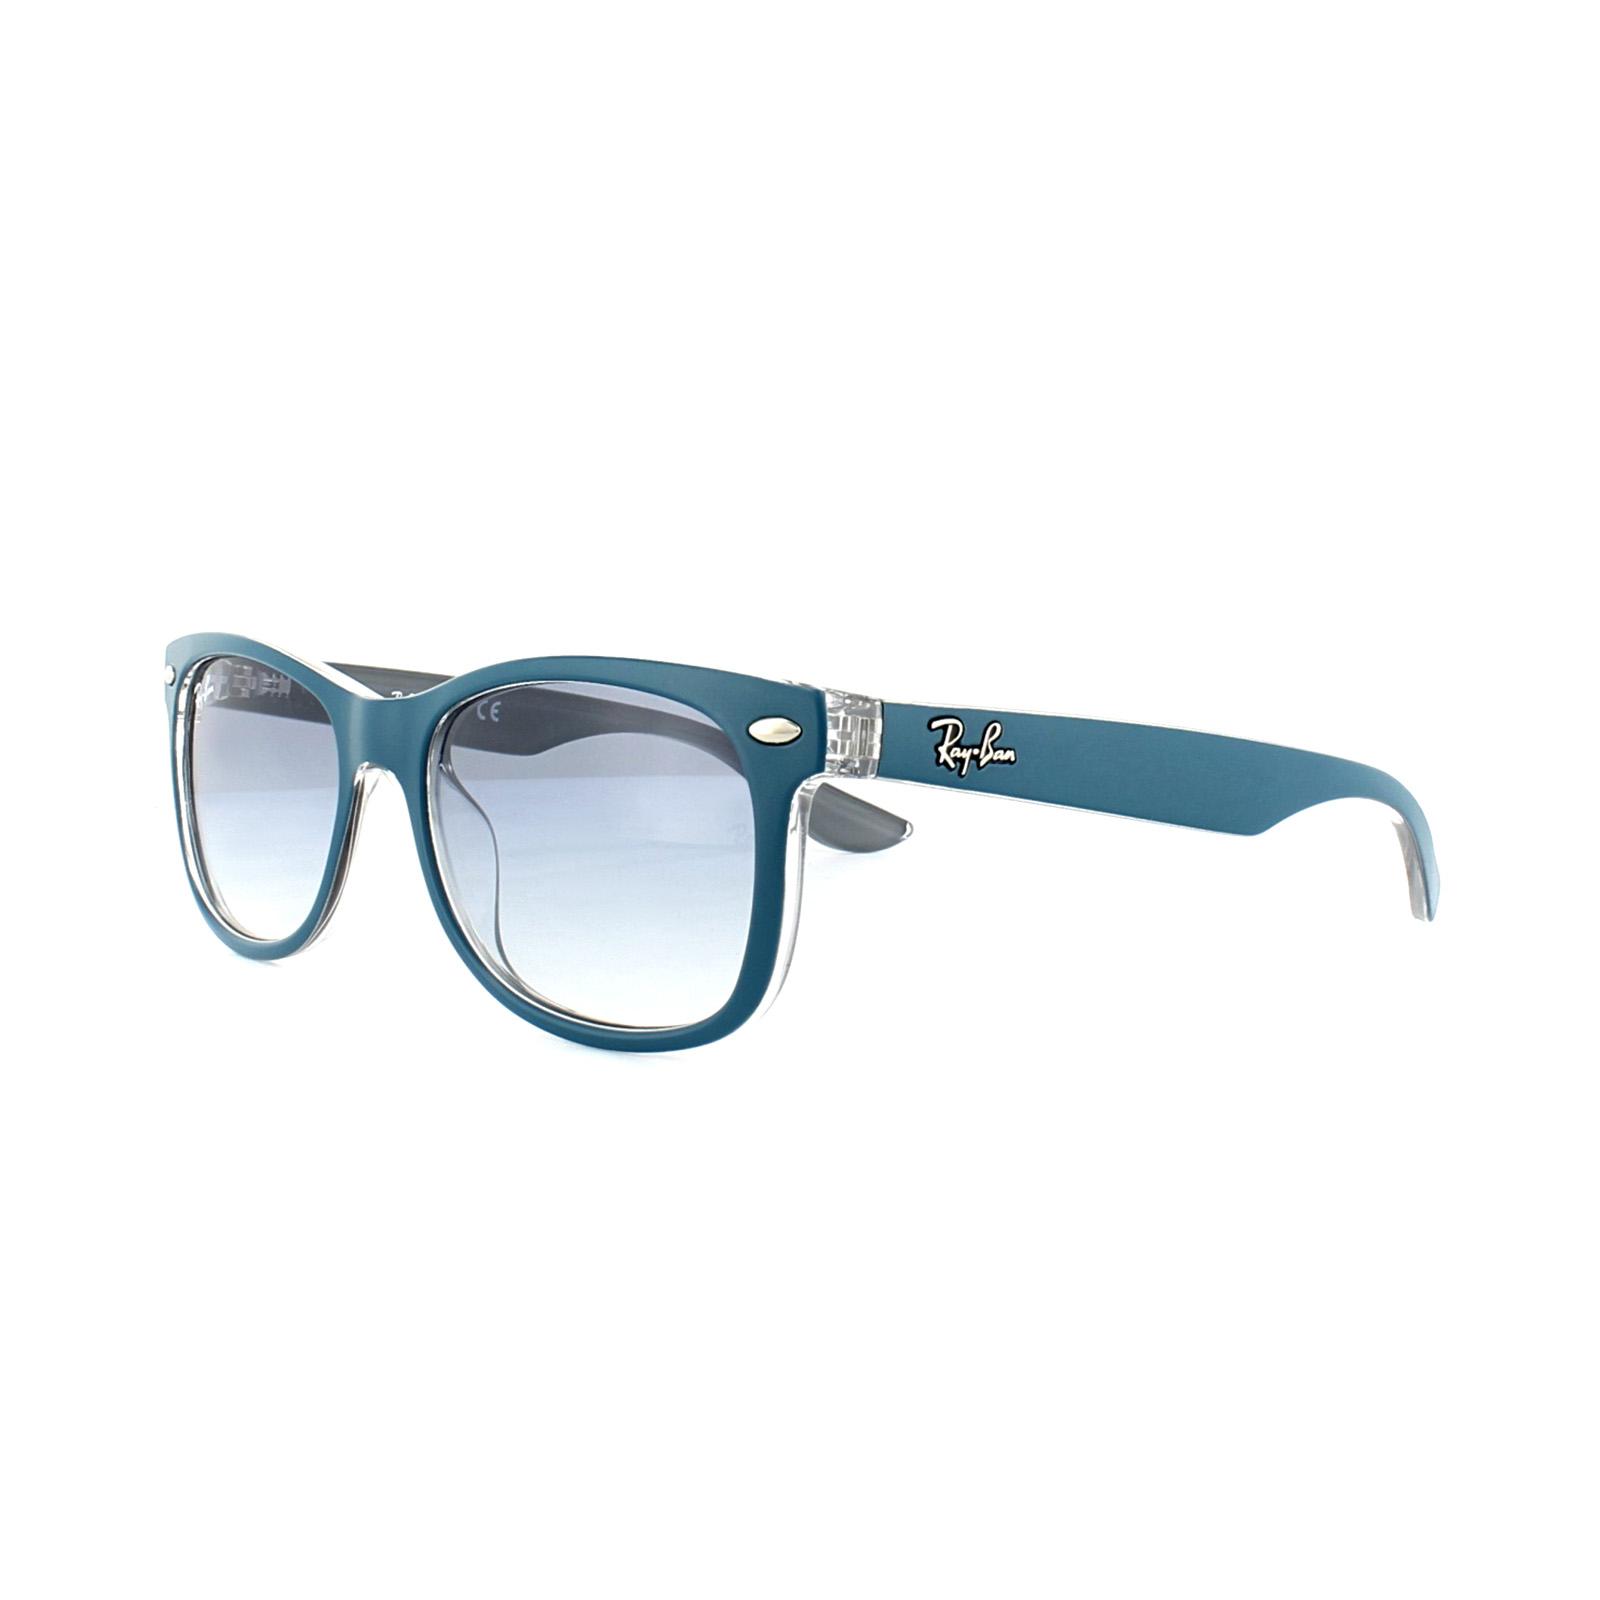 bfcc4c6e861c9 CENTINELA Ray-Ban Junior gafas de sol 9052S 703419 cristal azul degradado  azul luz